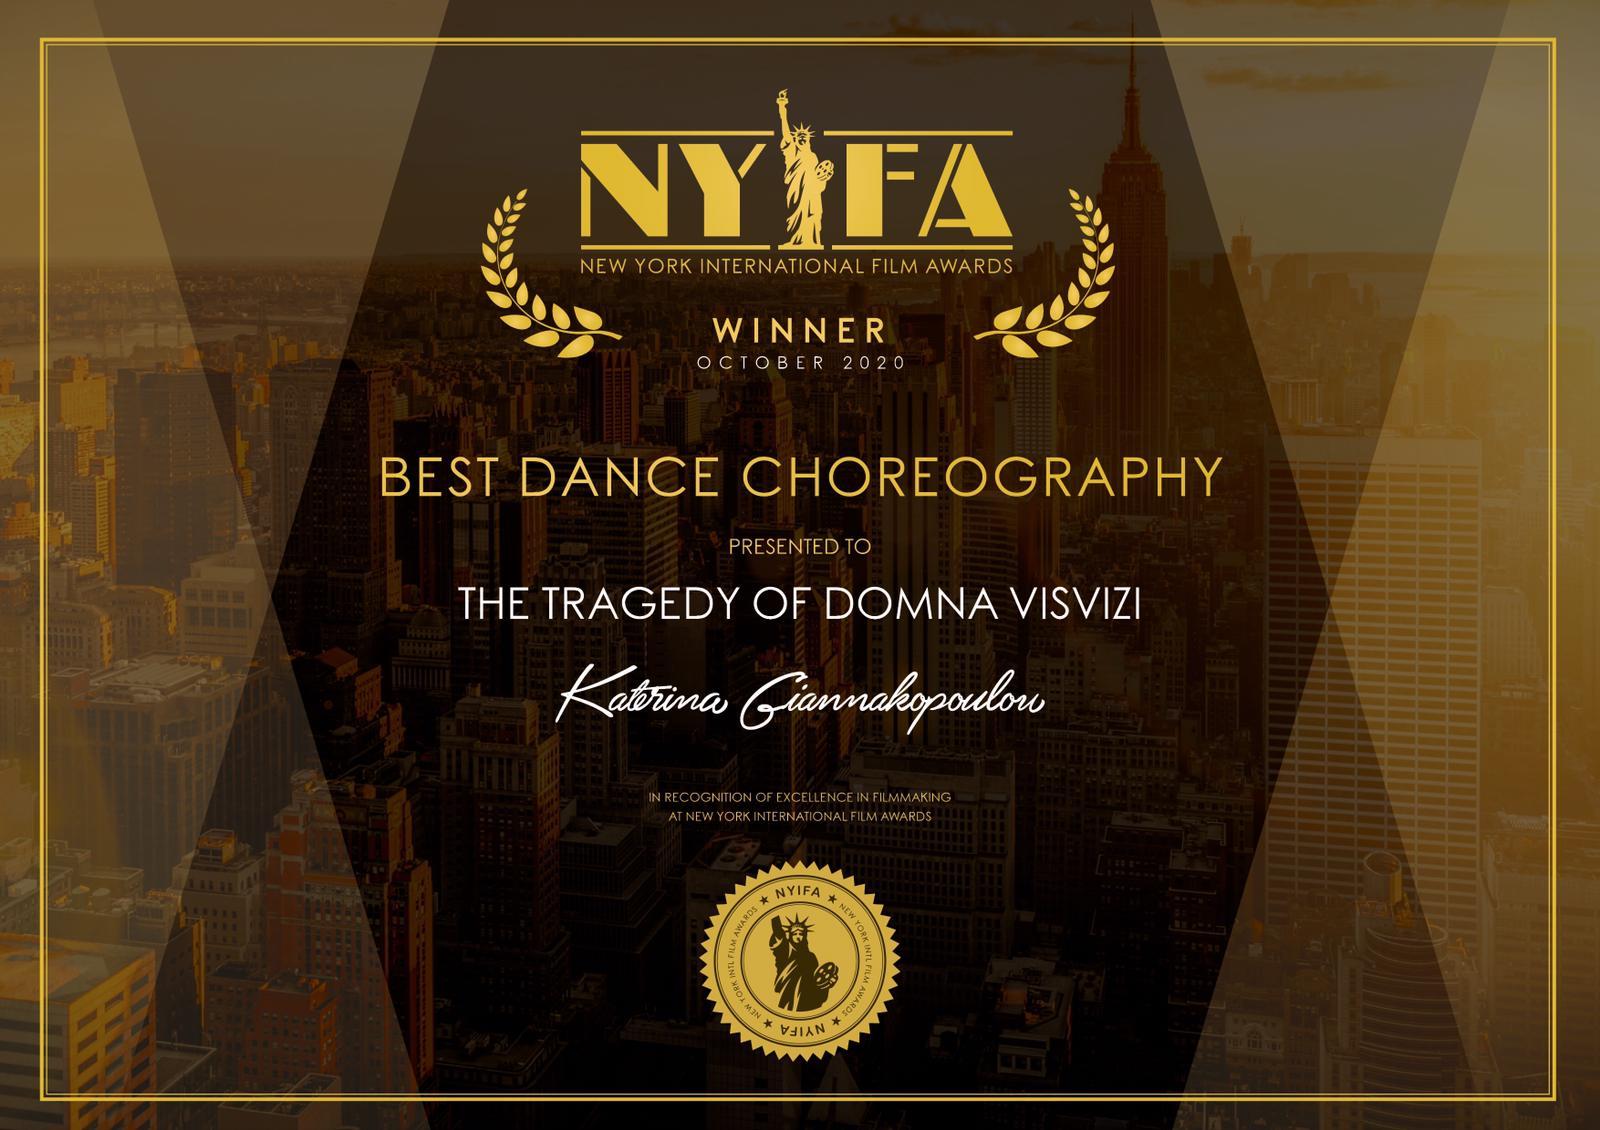 Award, Filmaward, dance, choreography, experimental, performance